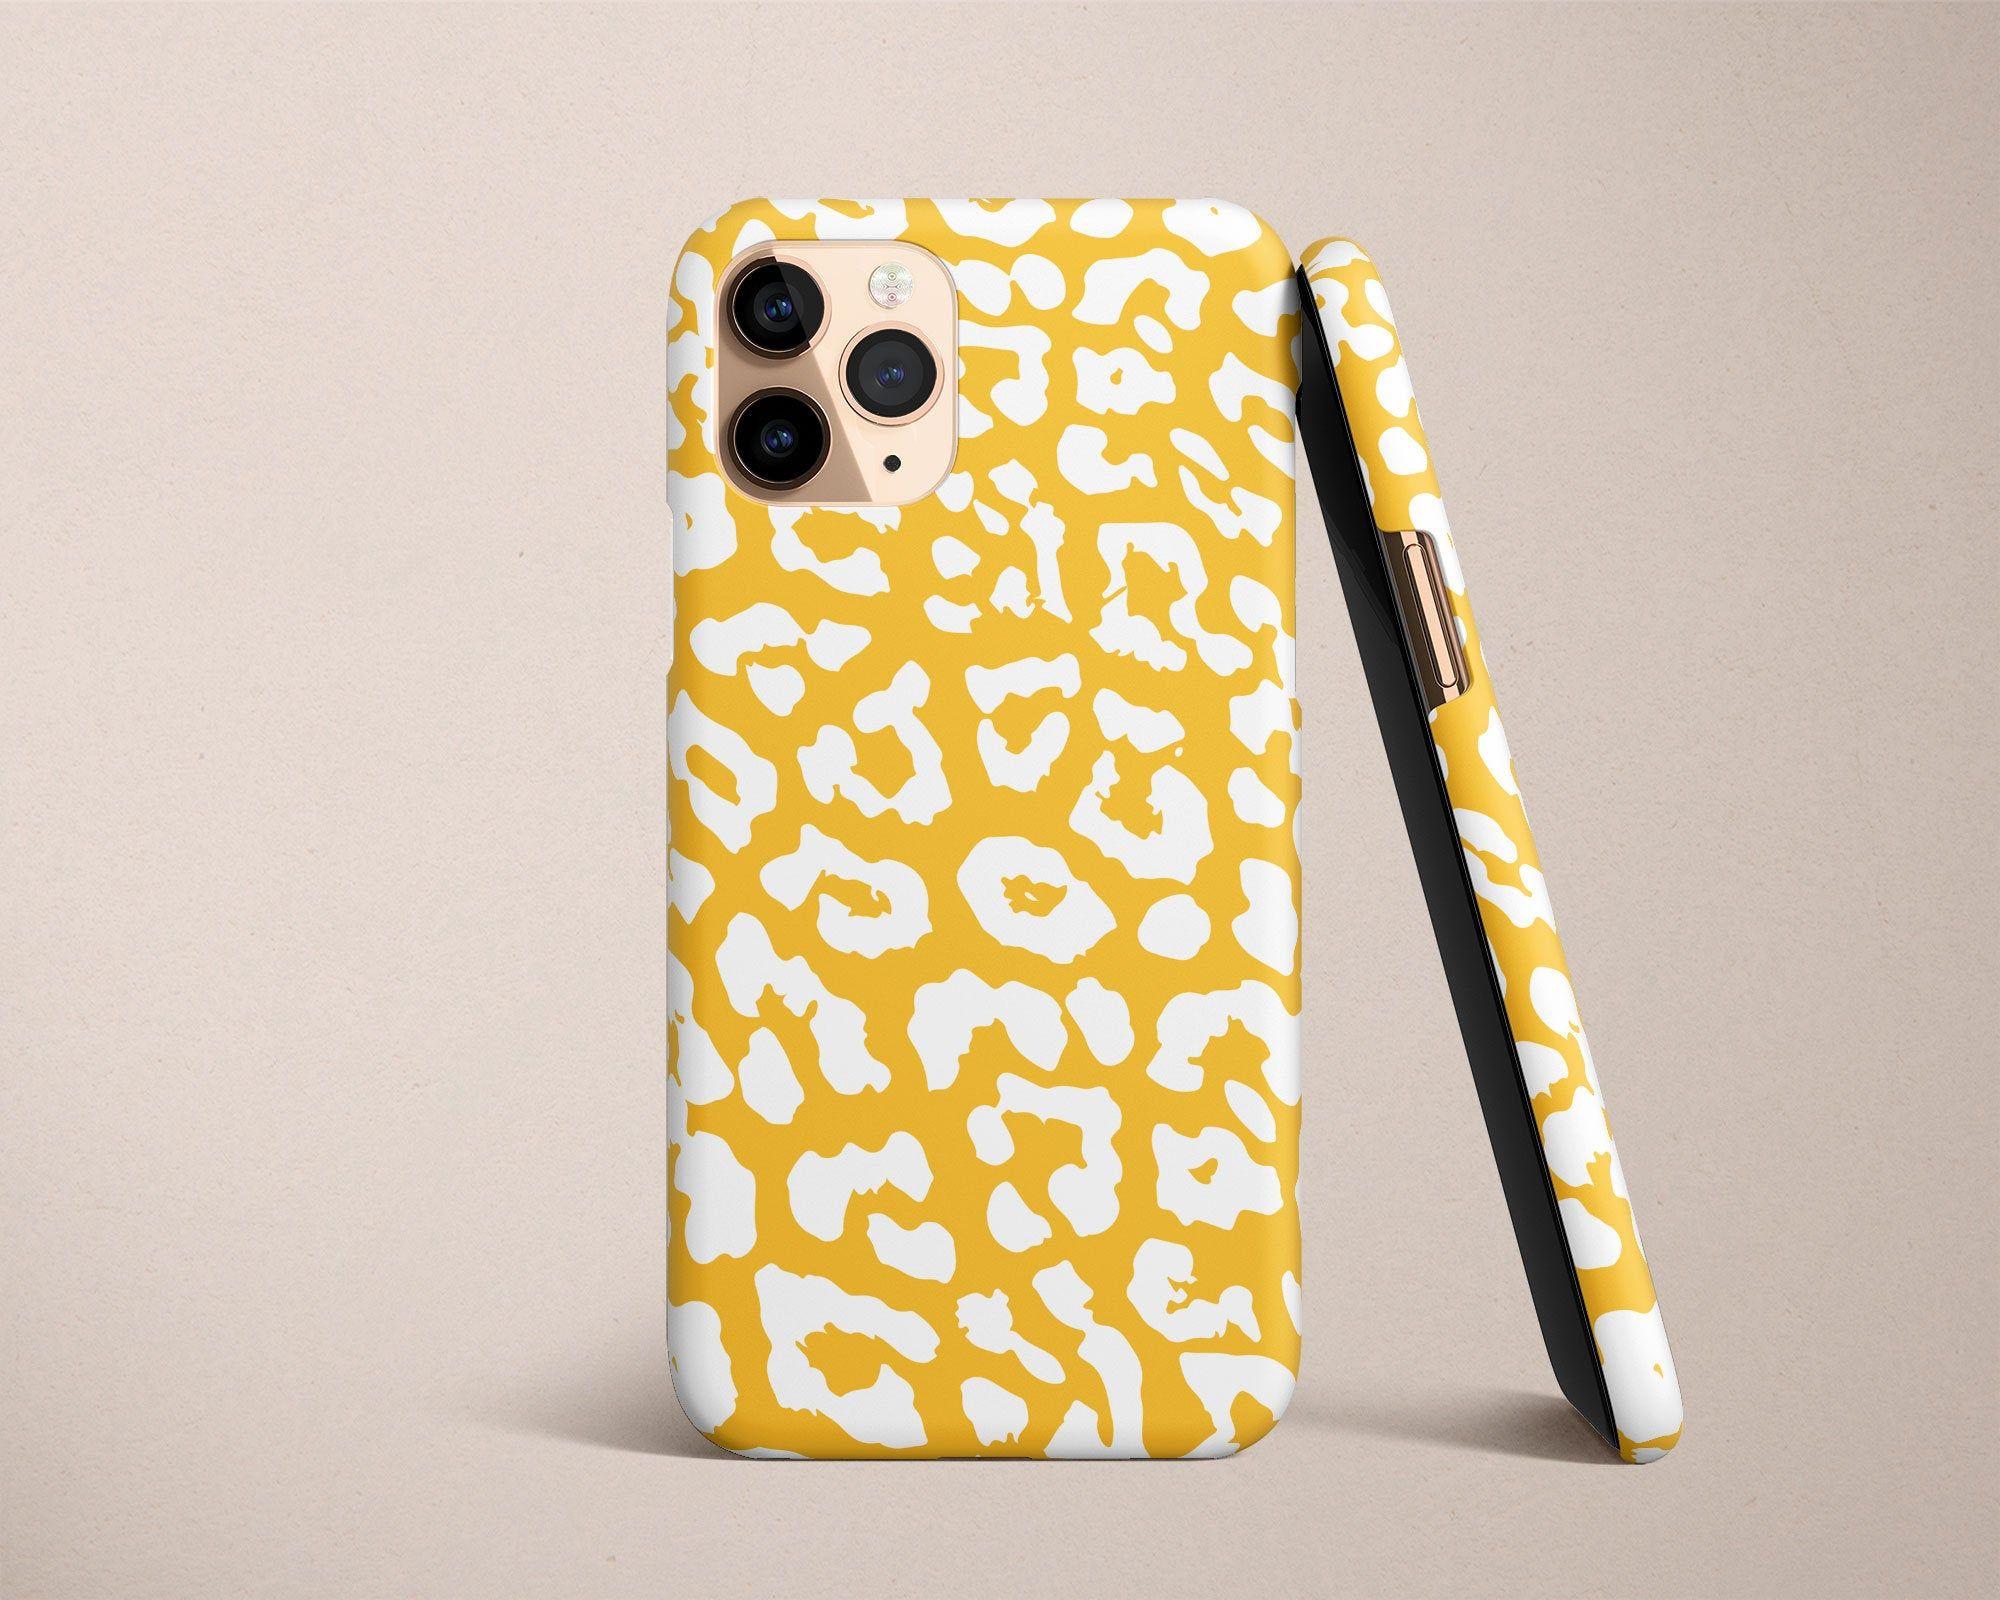 Mustard Yellow Cheetah Print Google Pixel Case Animal Print Pixel 5 Case Pixel 4 XL 4A 5G Leopard Pixel 3A XL Tough Case Pixel 2 Phone Case